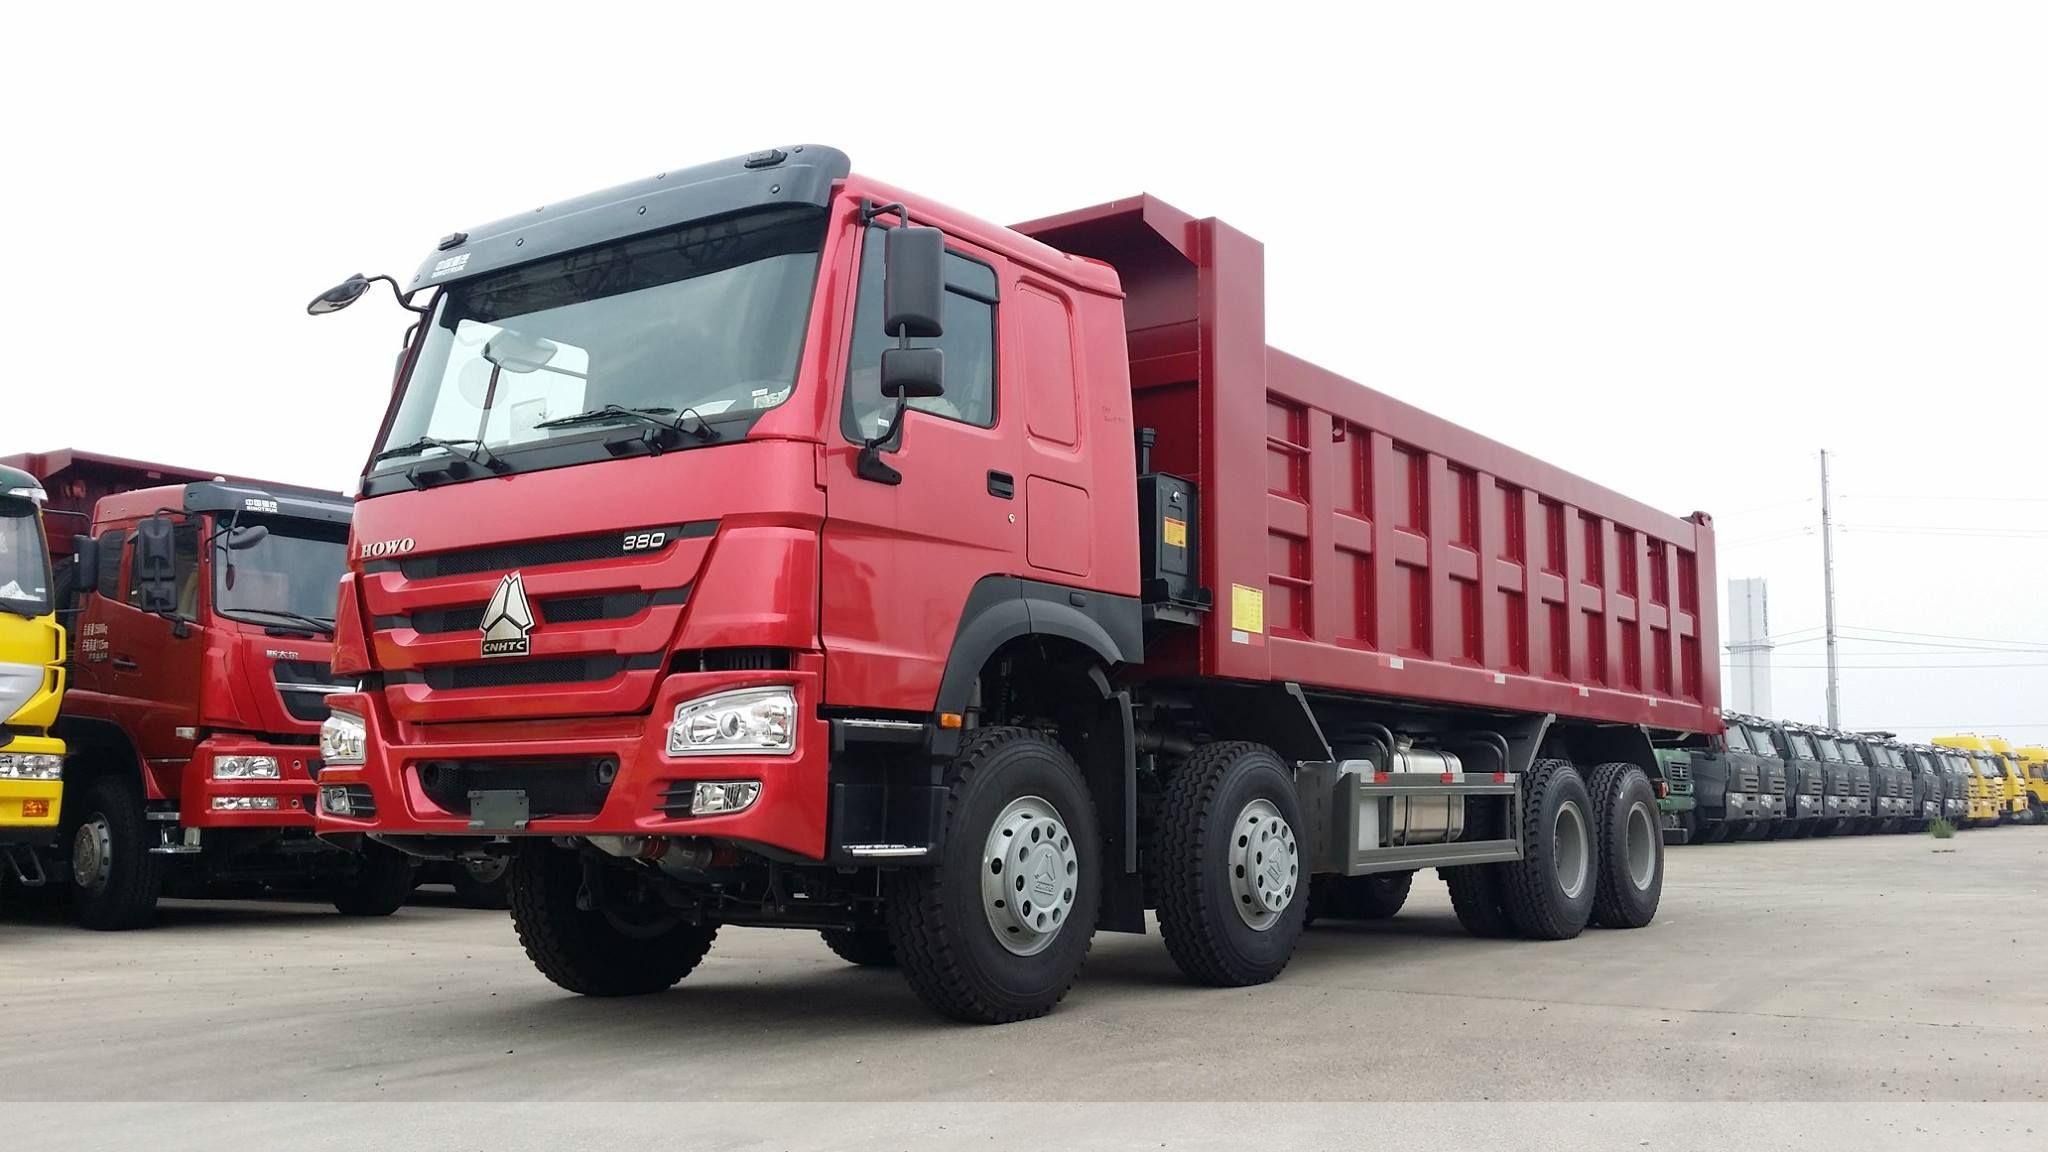 Sinotruk Vehicle Co., LTD - Tipper Trucks With GhanaTrader.com : Buy ...